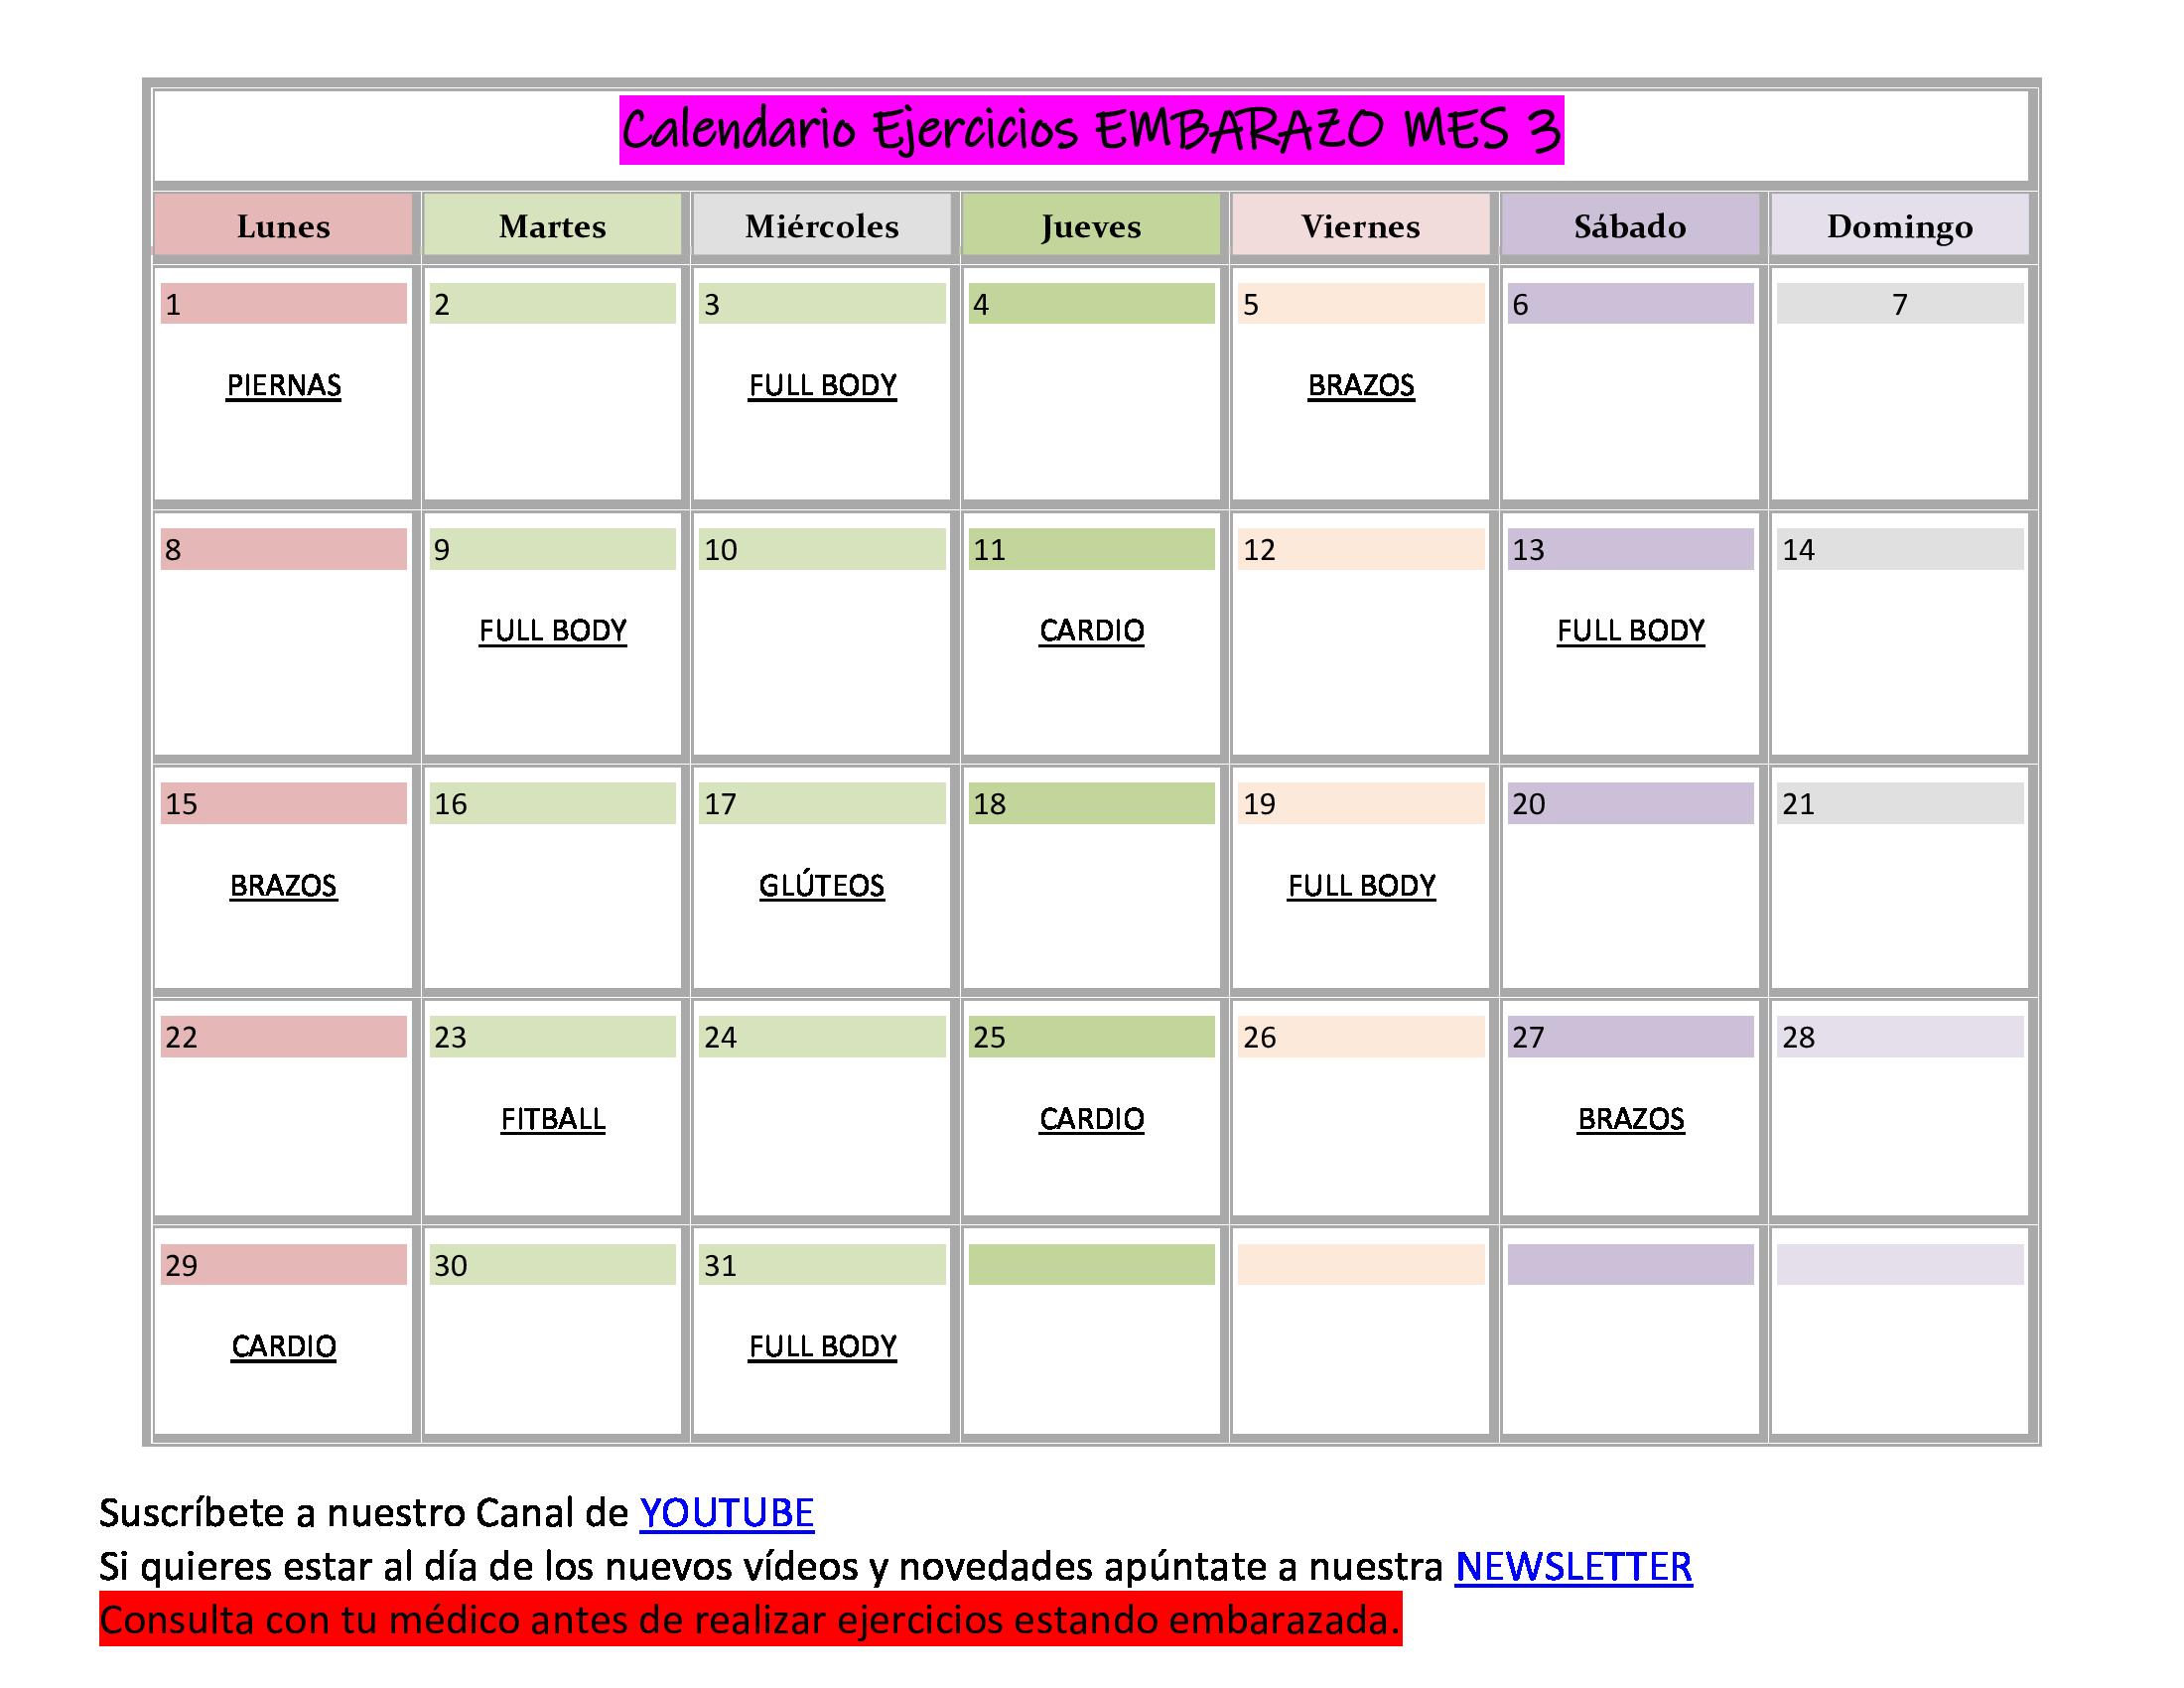 calendario mes 3 embarazo